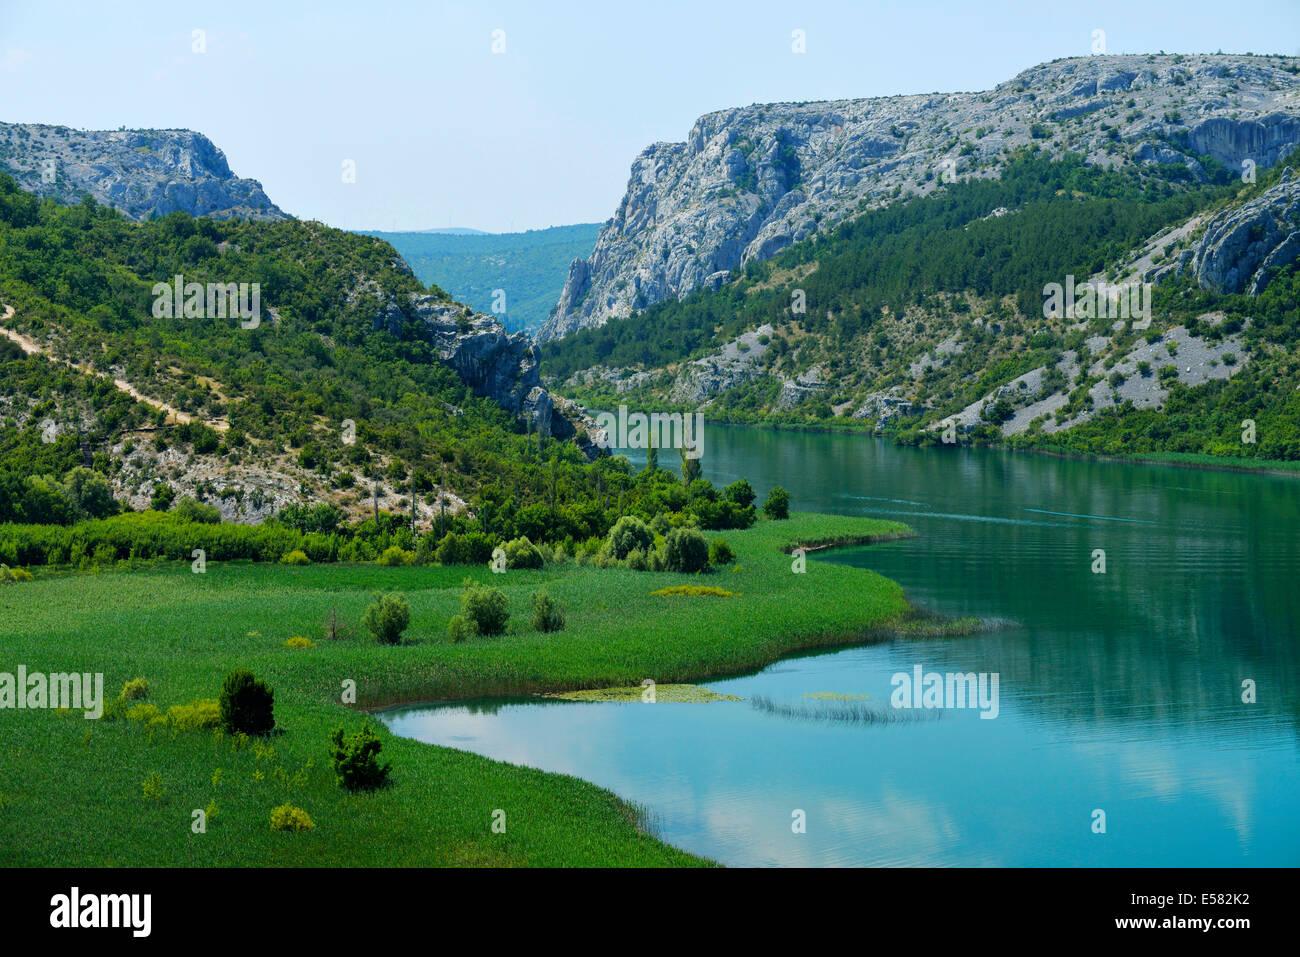 Krka river, Krka National Park, Roški Slap, Croatia Stock Photo